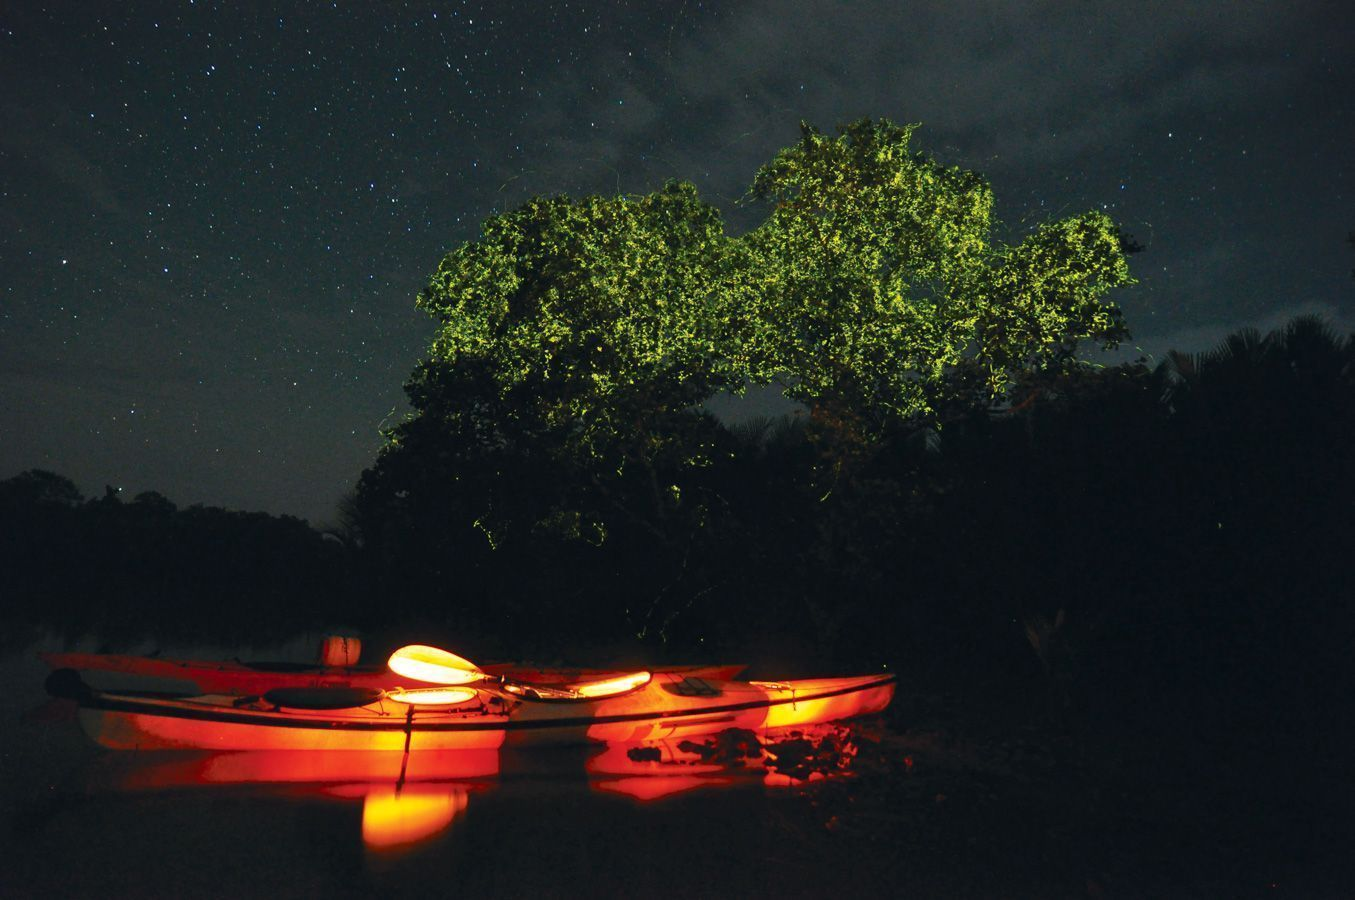 les-voyageuses-test-kayak-nocturne-lucioles-bohol-philippines3